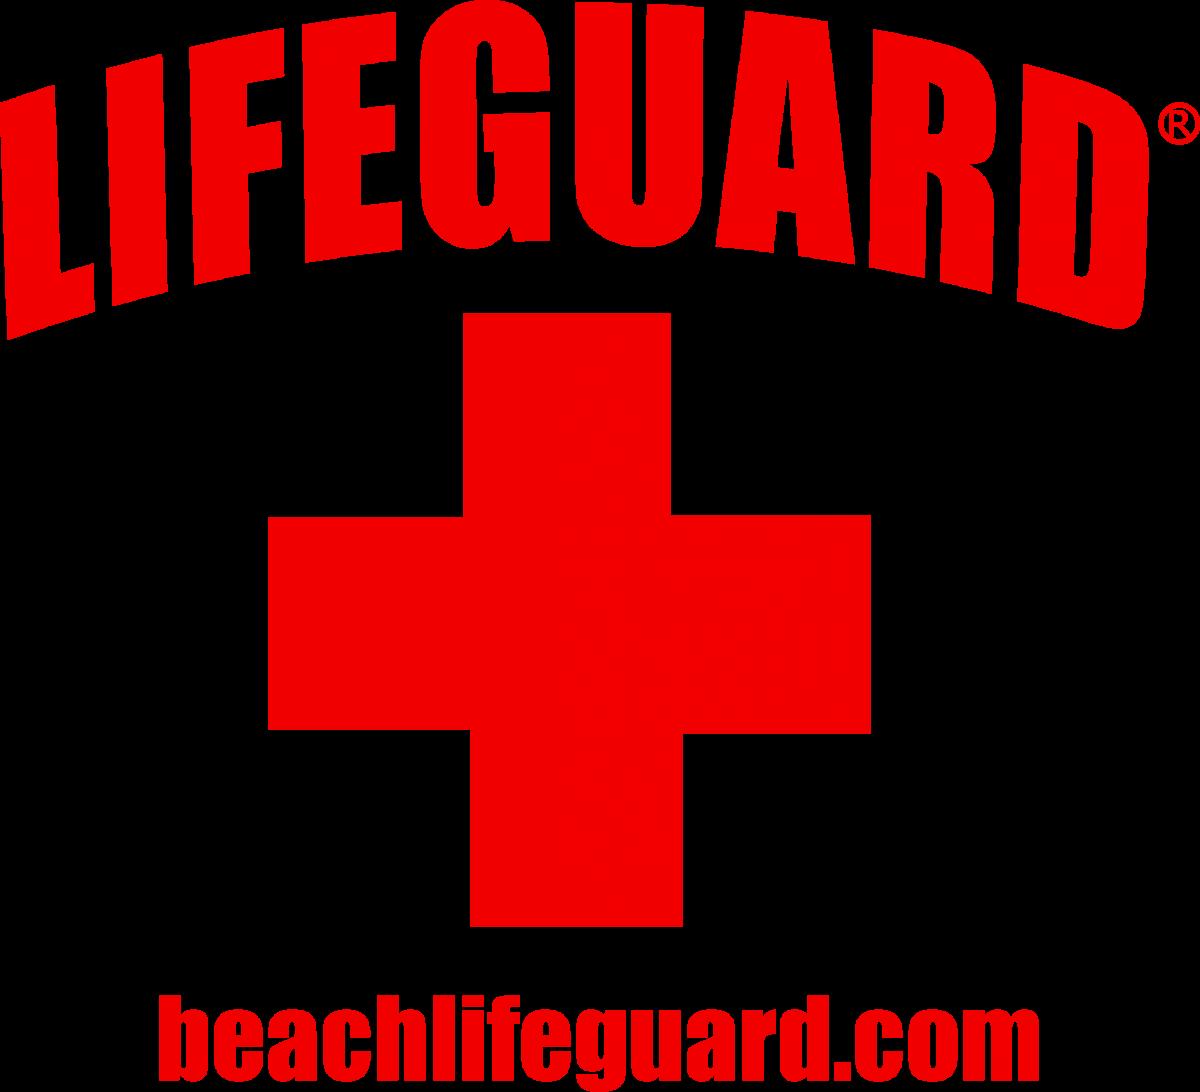 Lifeguard cross clipart royalty free Lifeguard Logos royalty free